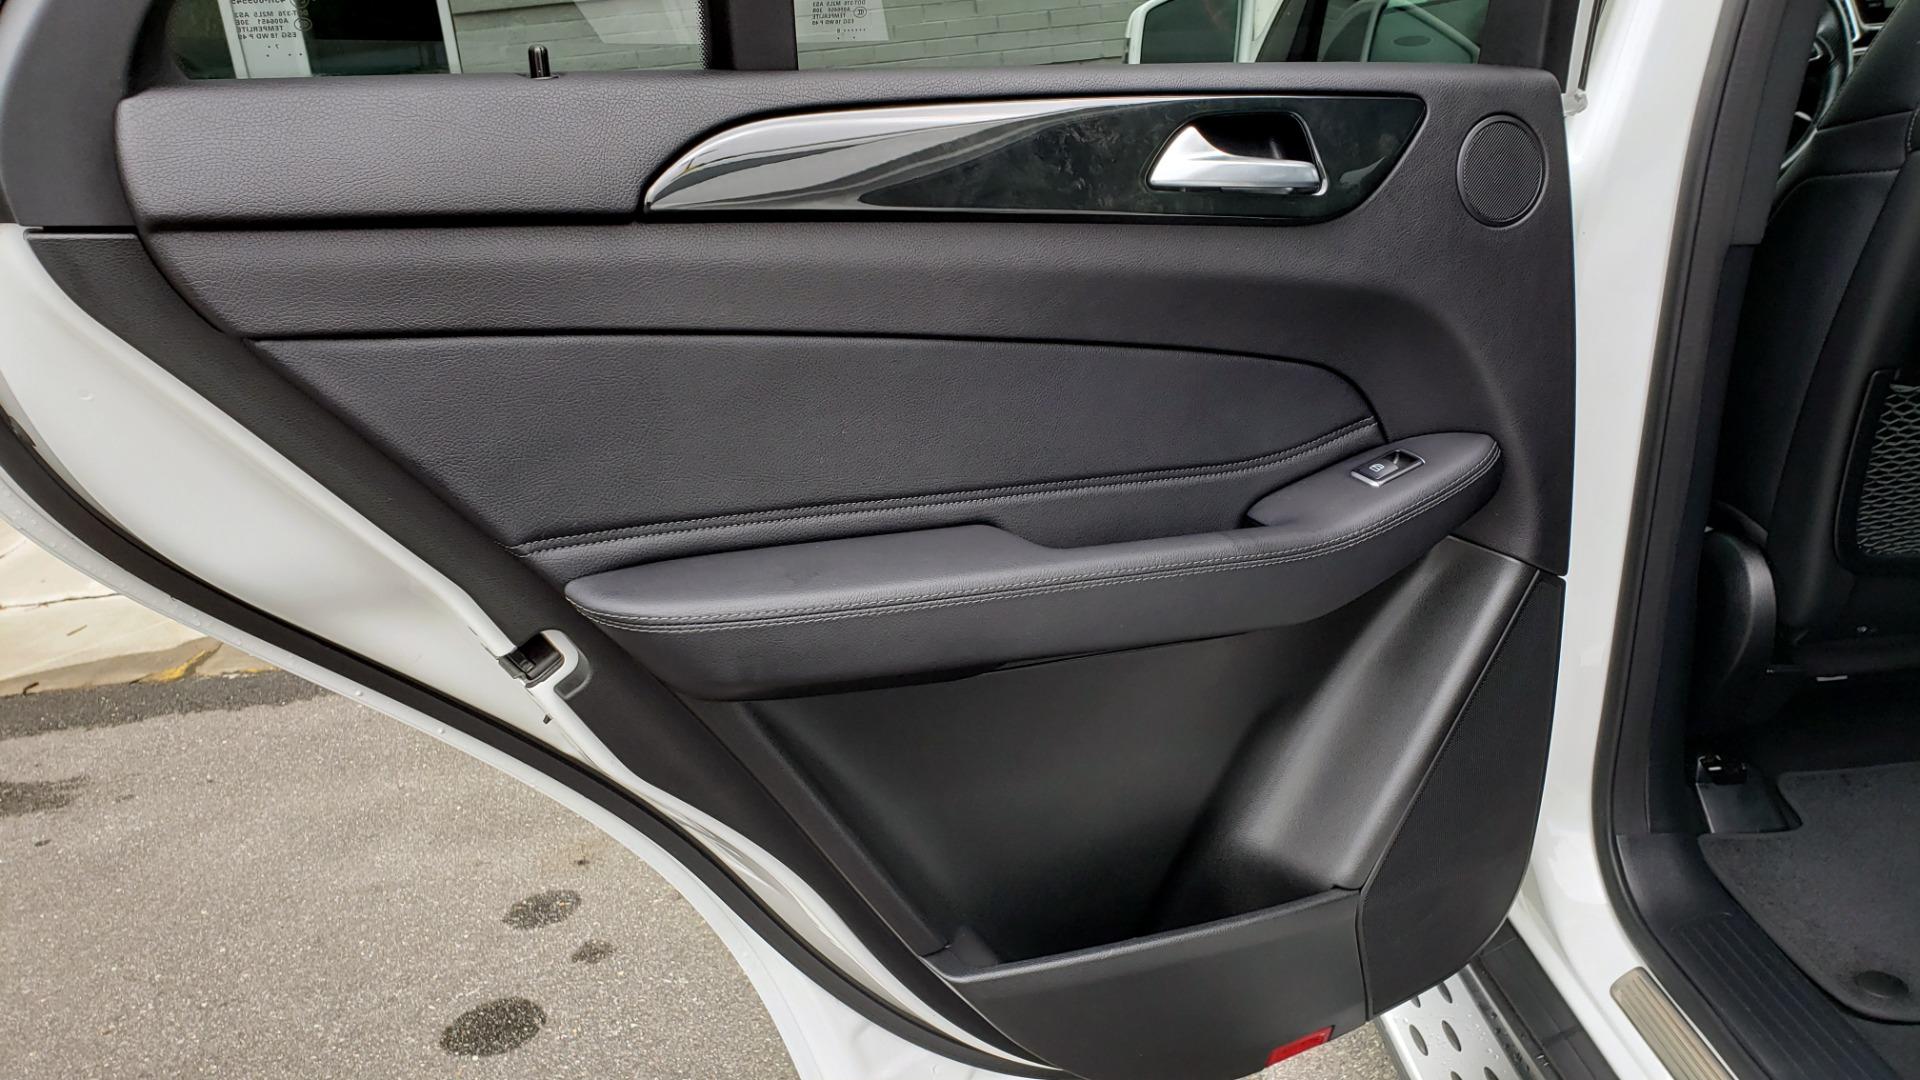 Used 2018 Mercedes-Benz GLE 350 4MATIC / PREM PKG / NAV / PARK ASST / K/H SND / HITCH / REARVIEW for sale $40,801 at Formula Imports in Charlotte NC 28227 61